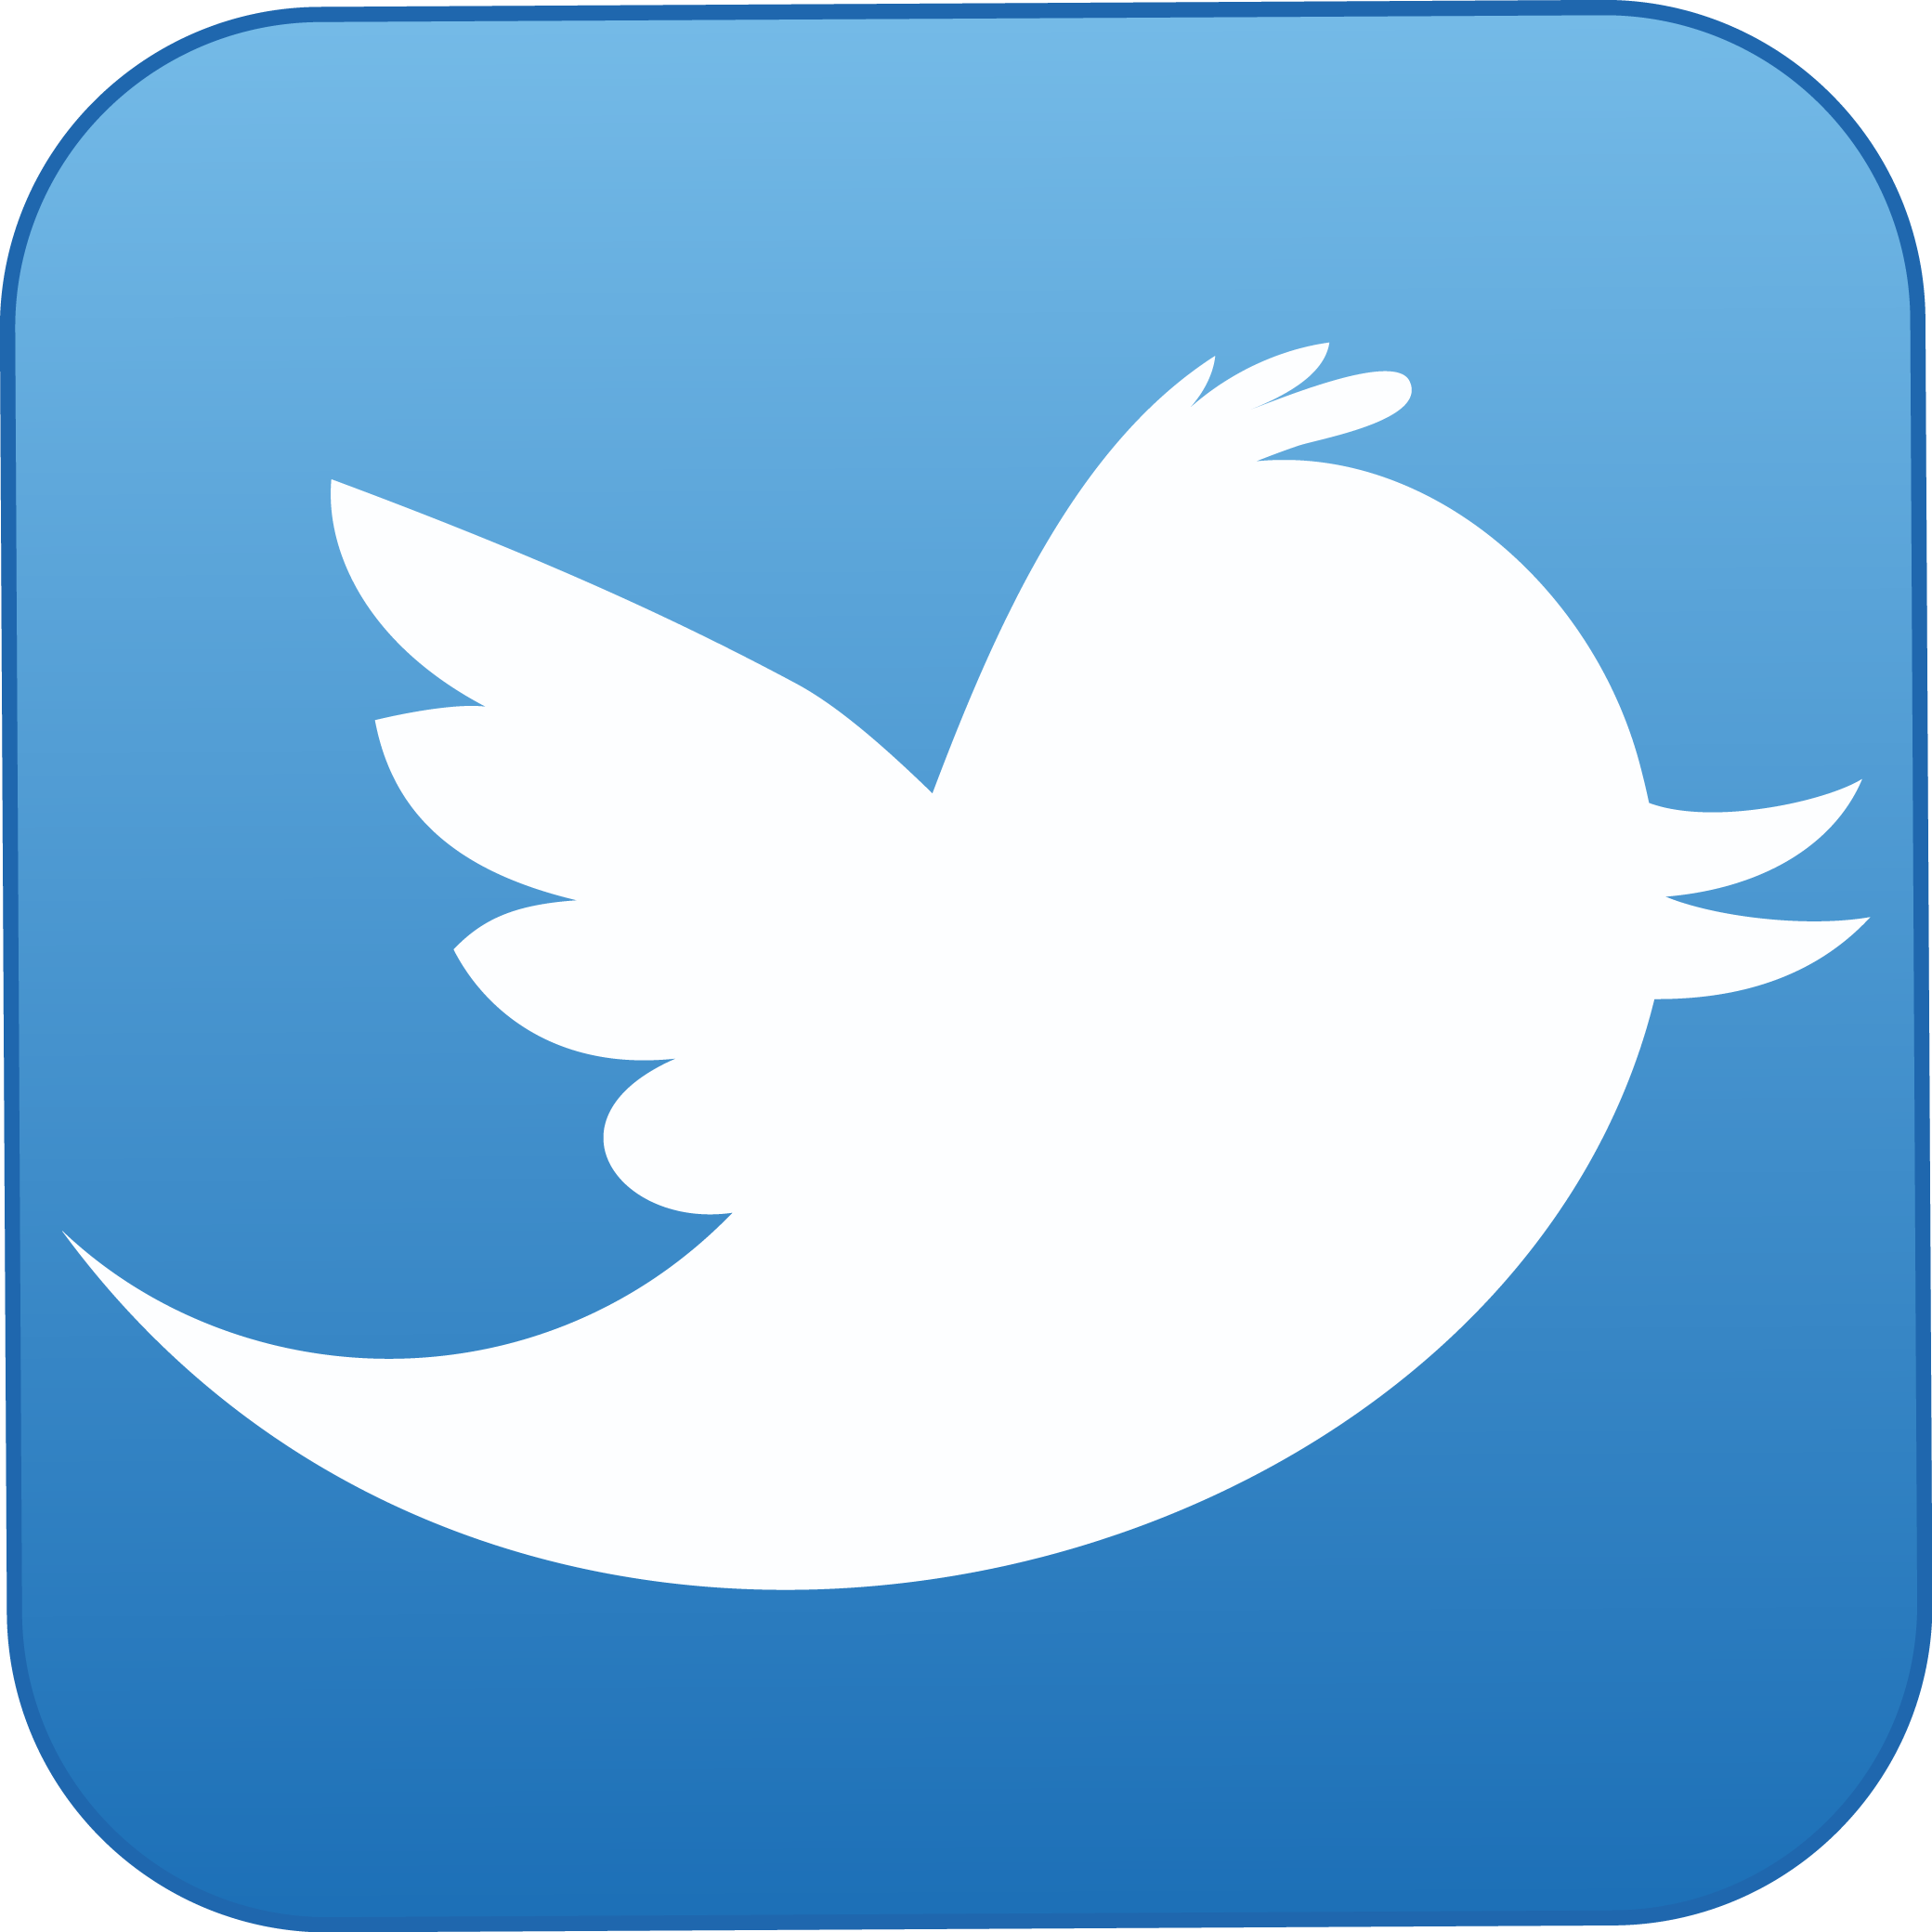 twitter_logo1-Copy.png